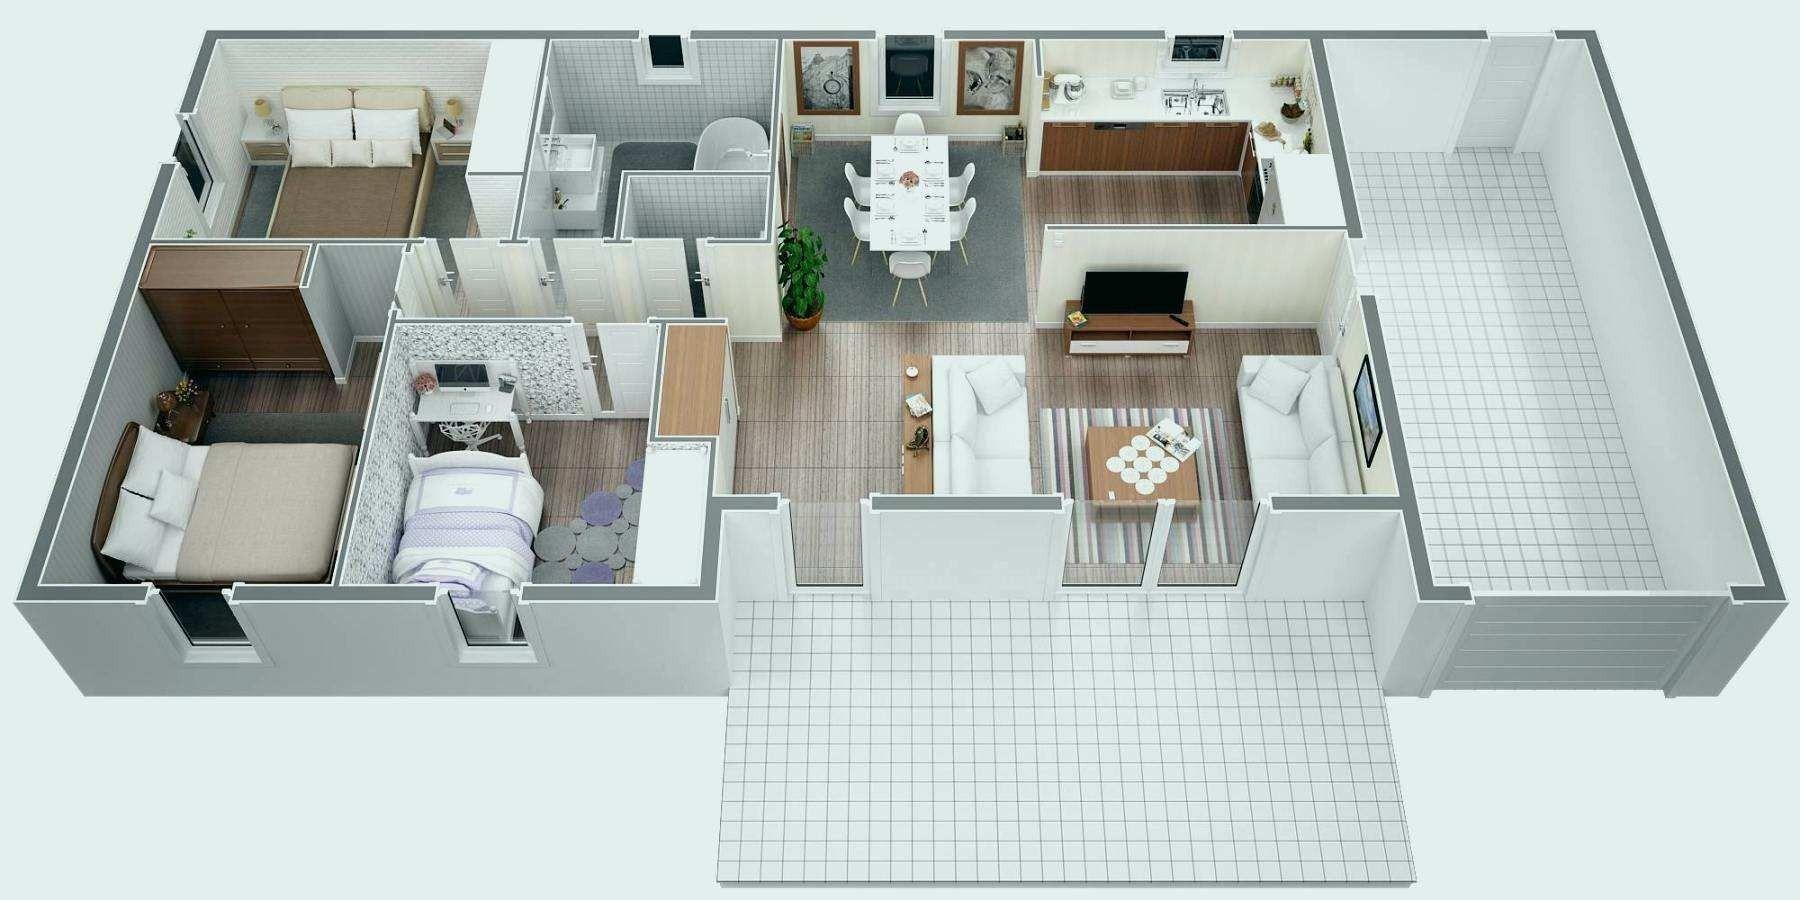 Plan Maison 80 M2 Plain Pied 120m2 Grand 80m2 2 Davidreed Co Image House Bedroom Design Home